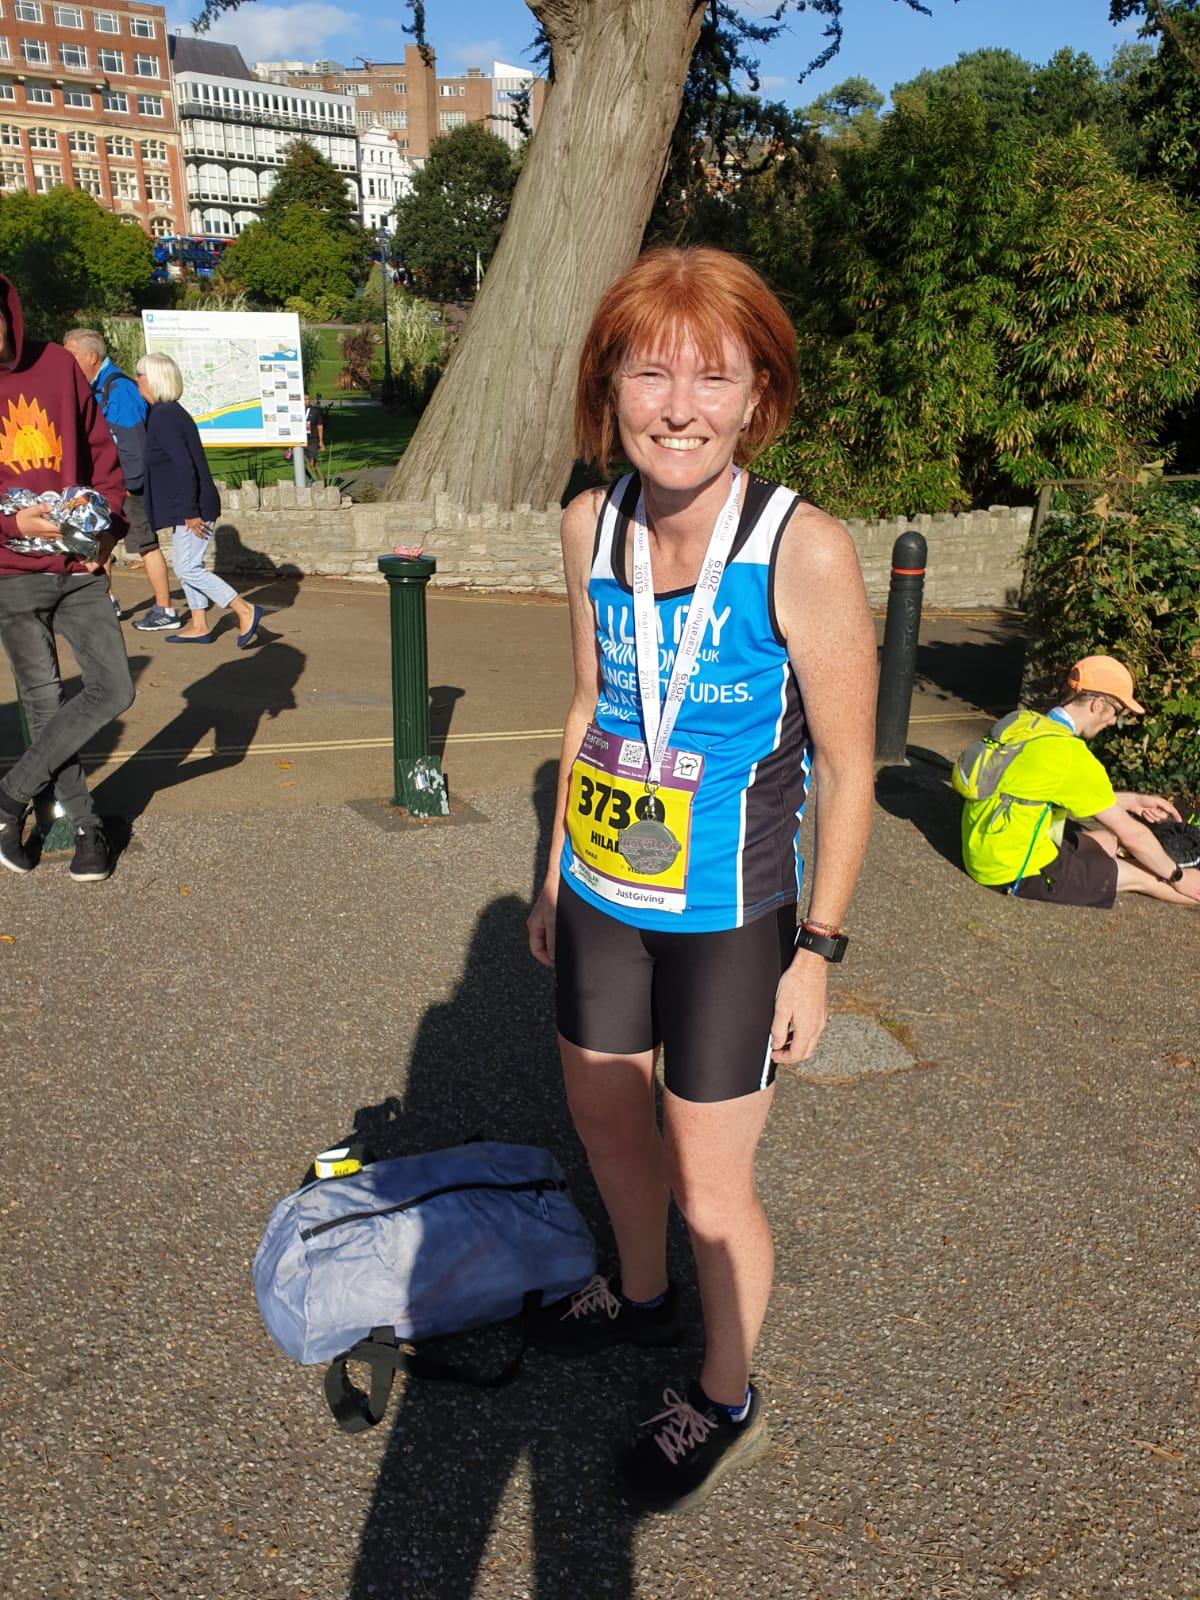 Just finished the Bournemouth Marathon